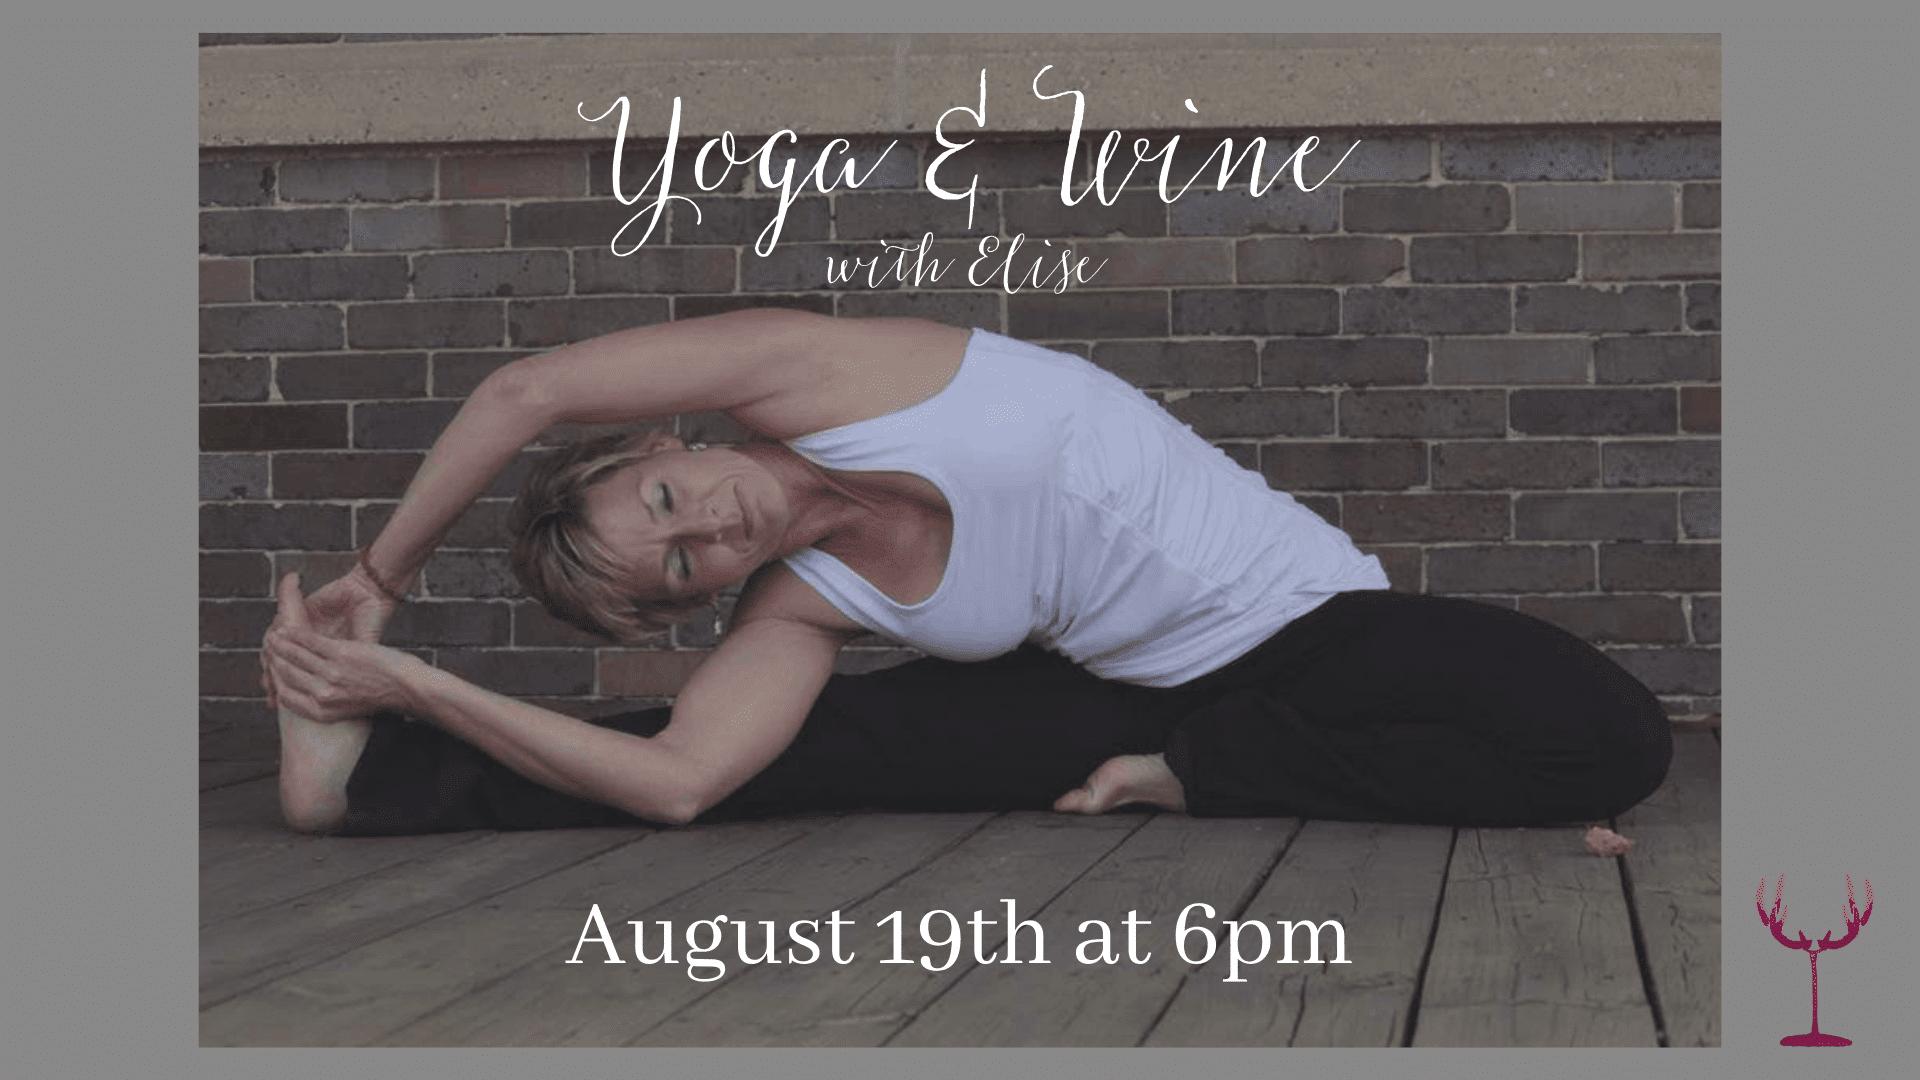 August Wine & Yoga